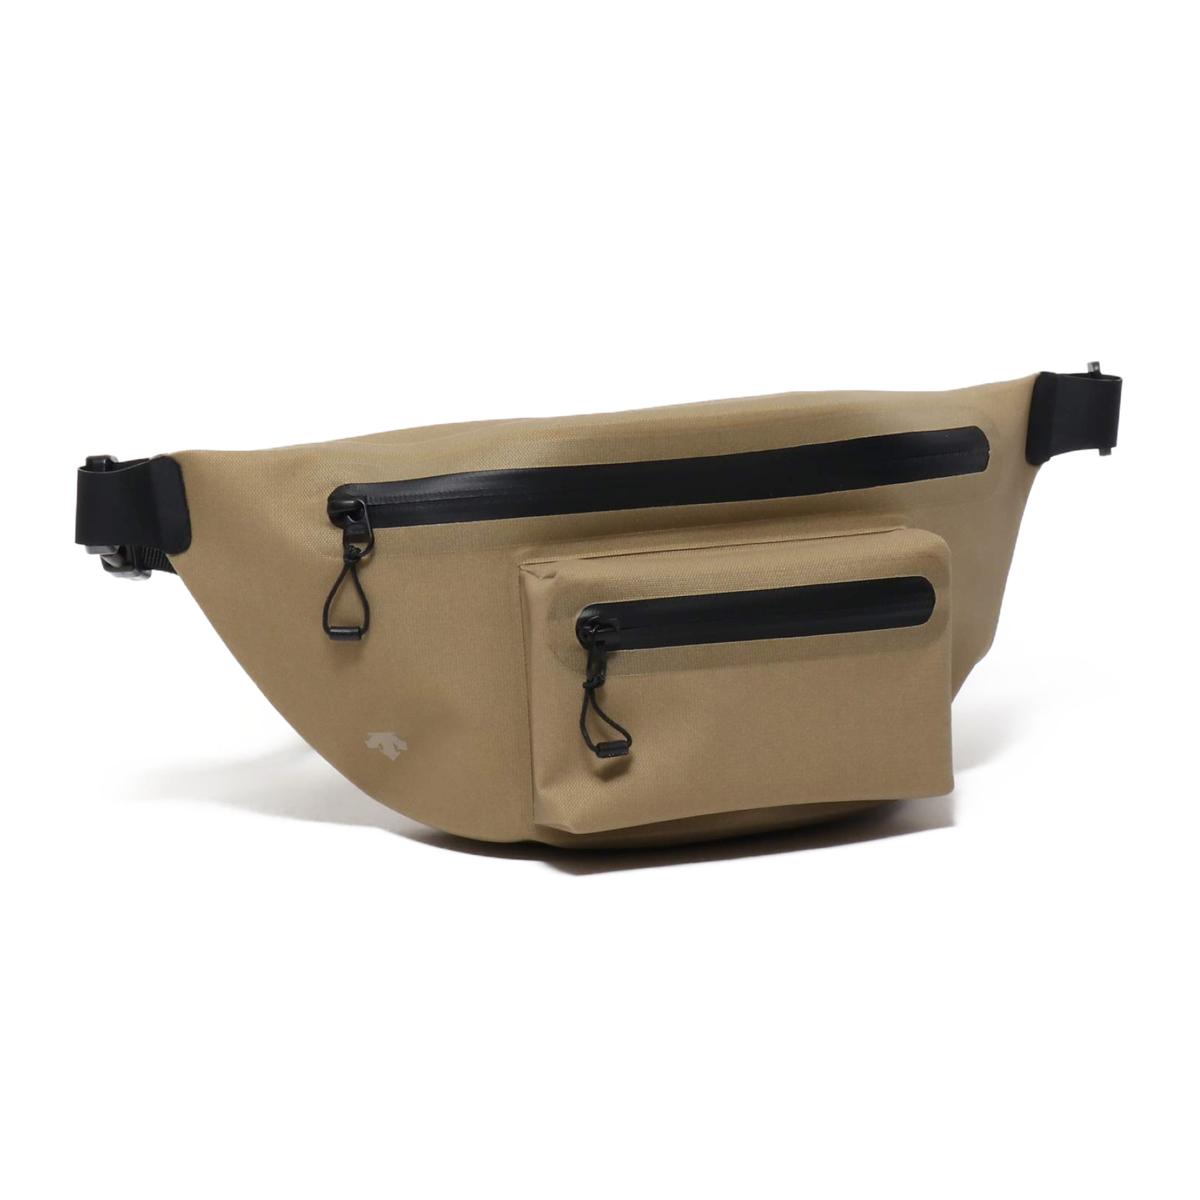 DESCENTE WAIST BAG(デサント ウエスト バッグ)BEIGE【メンズ レディース ウエストバッグ】18SU-I